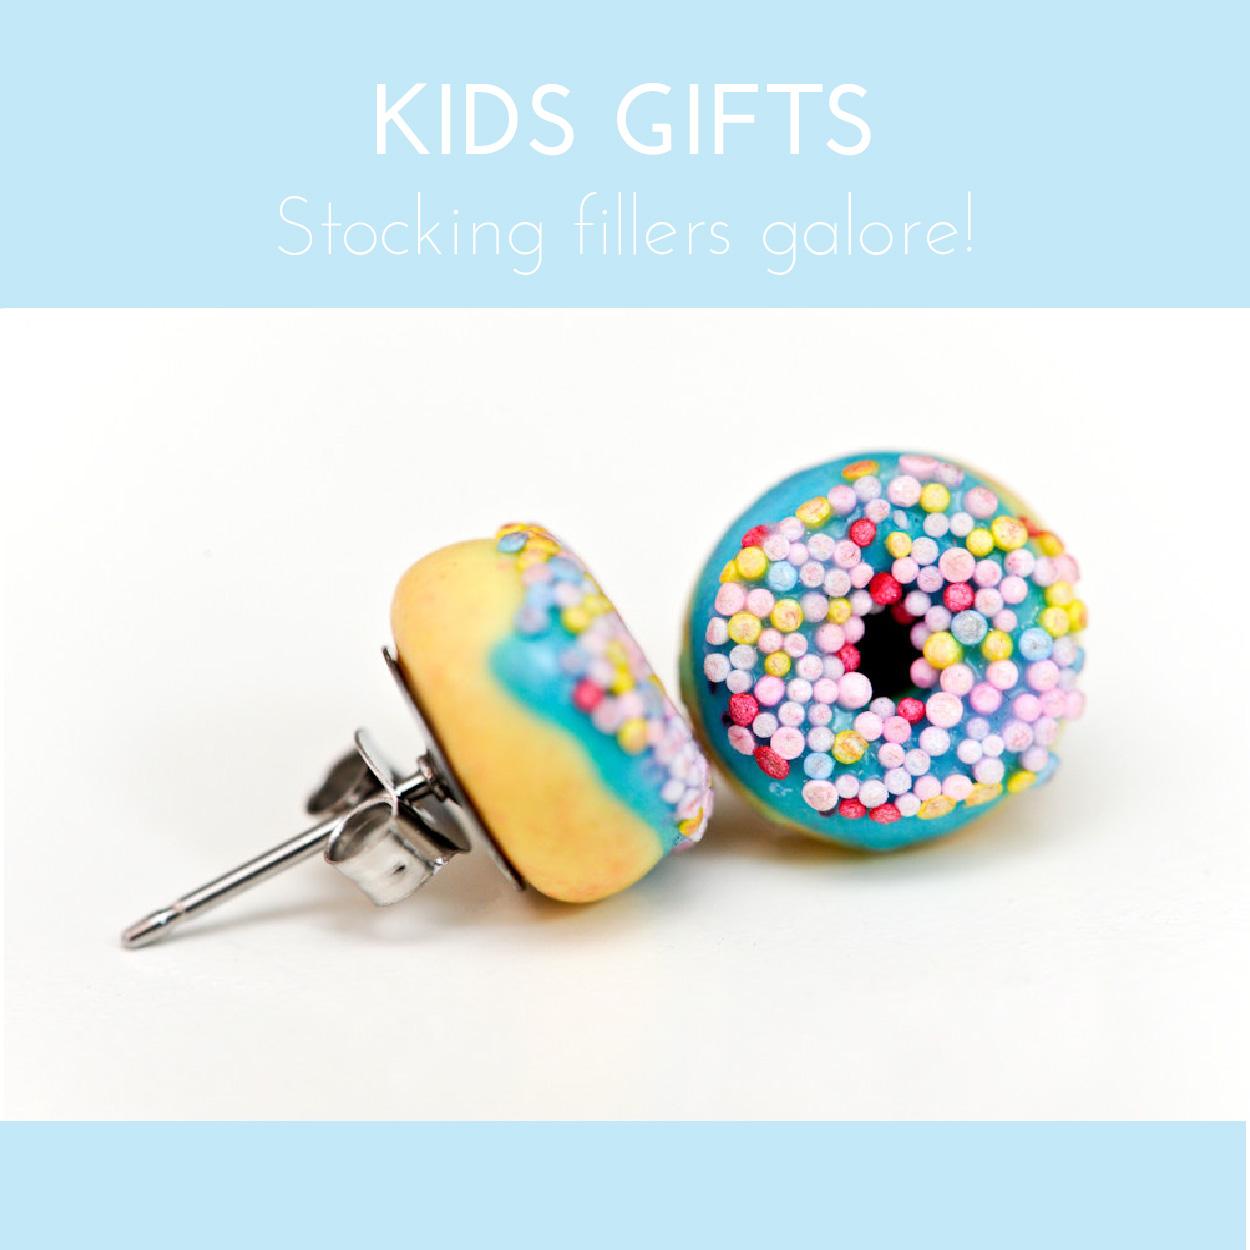 kids-gifts-01.jpg